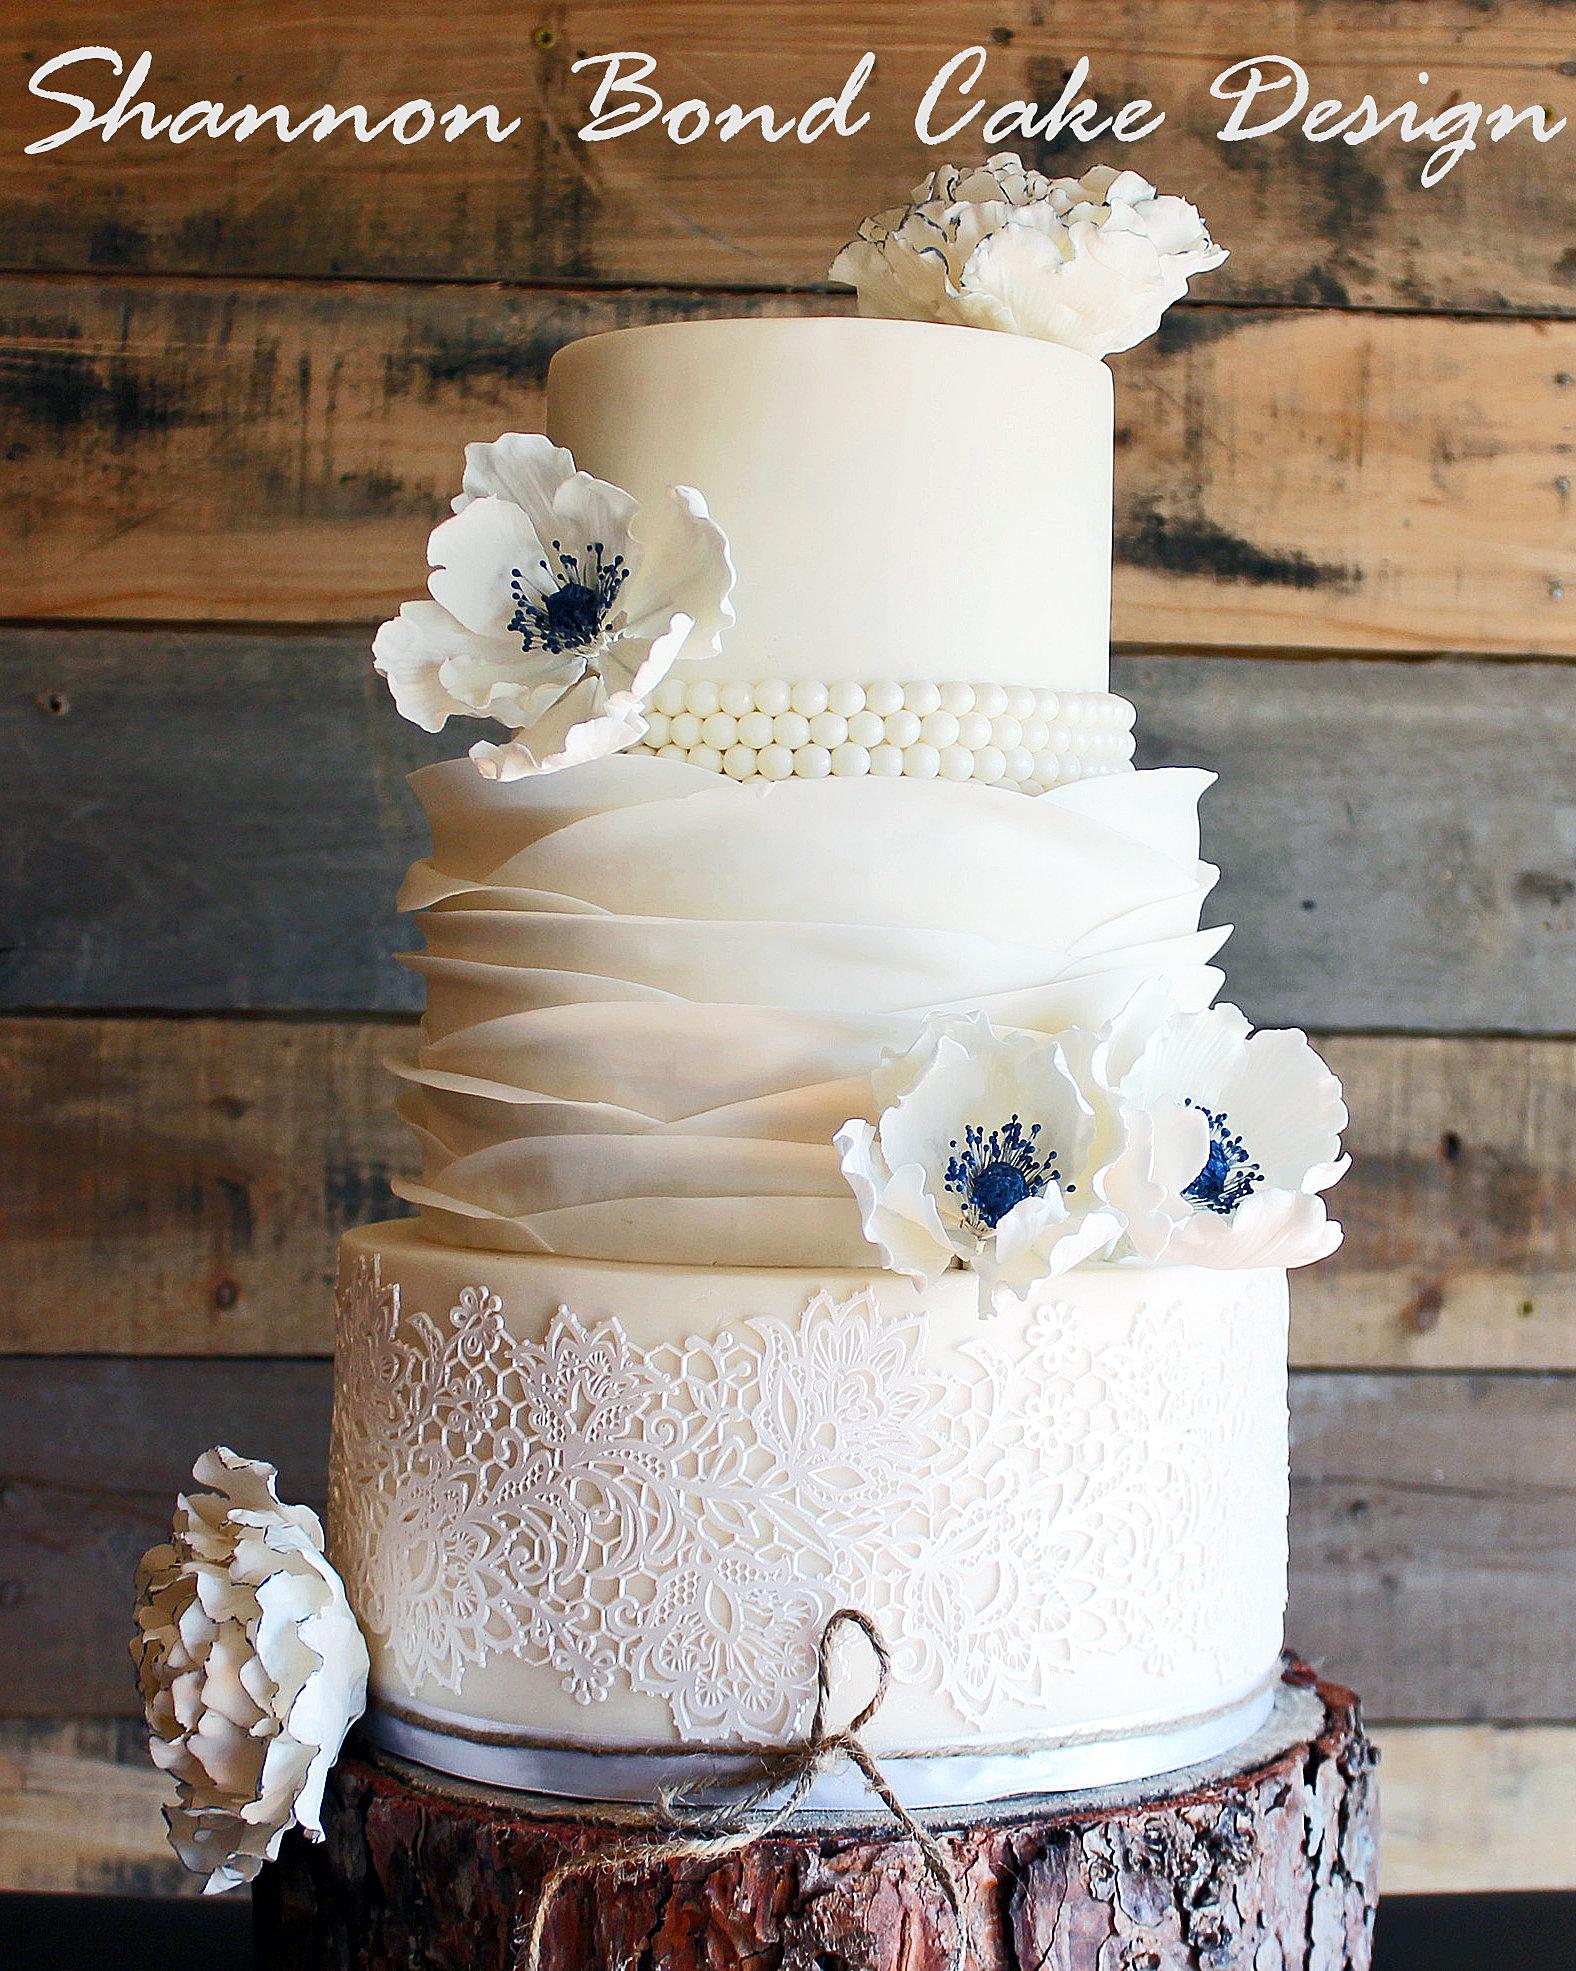 shannon bond cake design kansas city wedding and custom. Black Bedroom Furniture Sets. Home Design Ideas